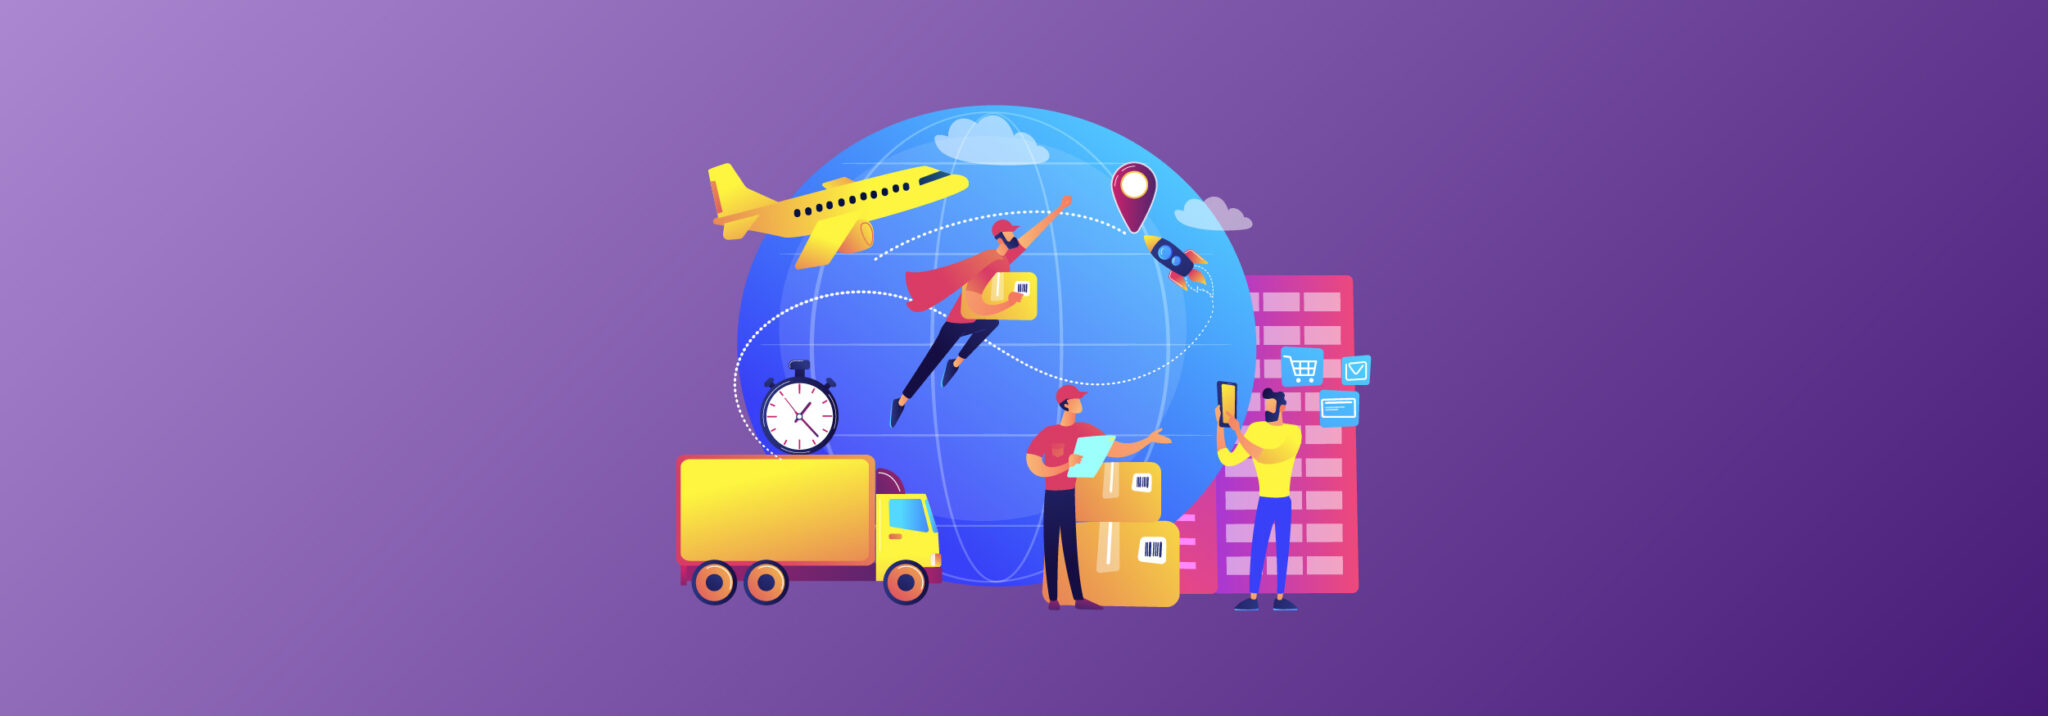 Aplicativo de logística